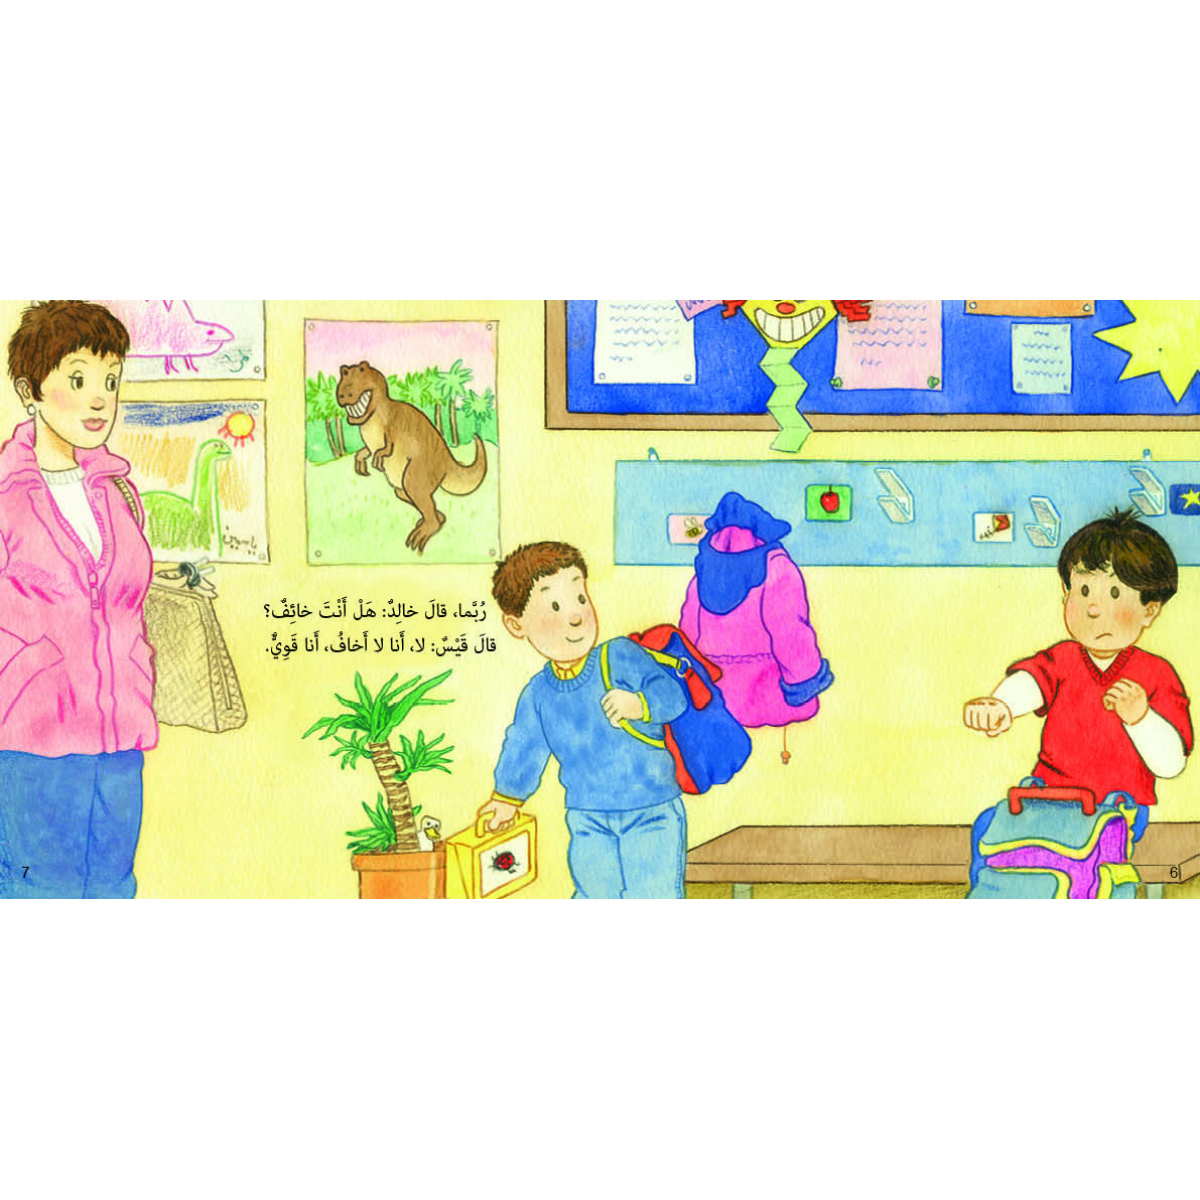 Qais Waiting for His Mom Spread (2)